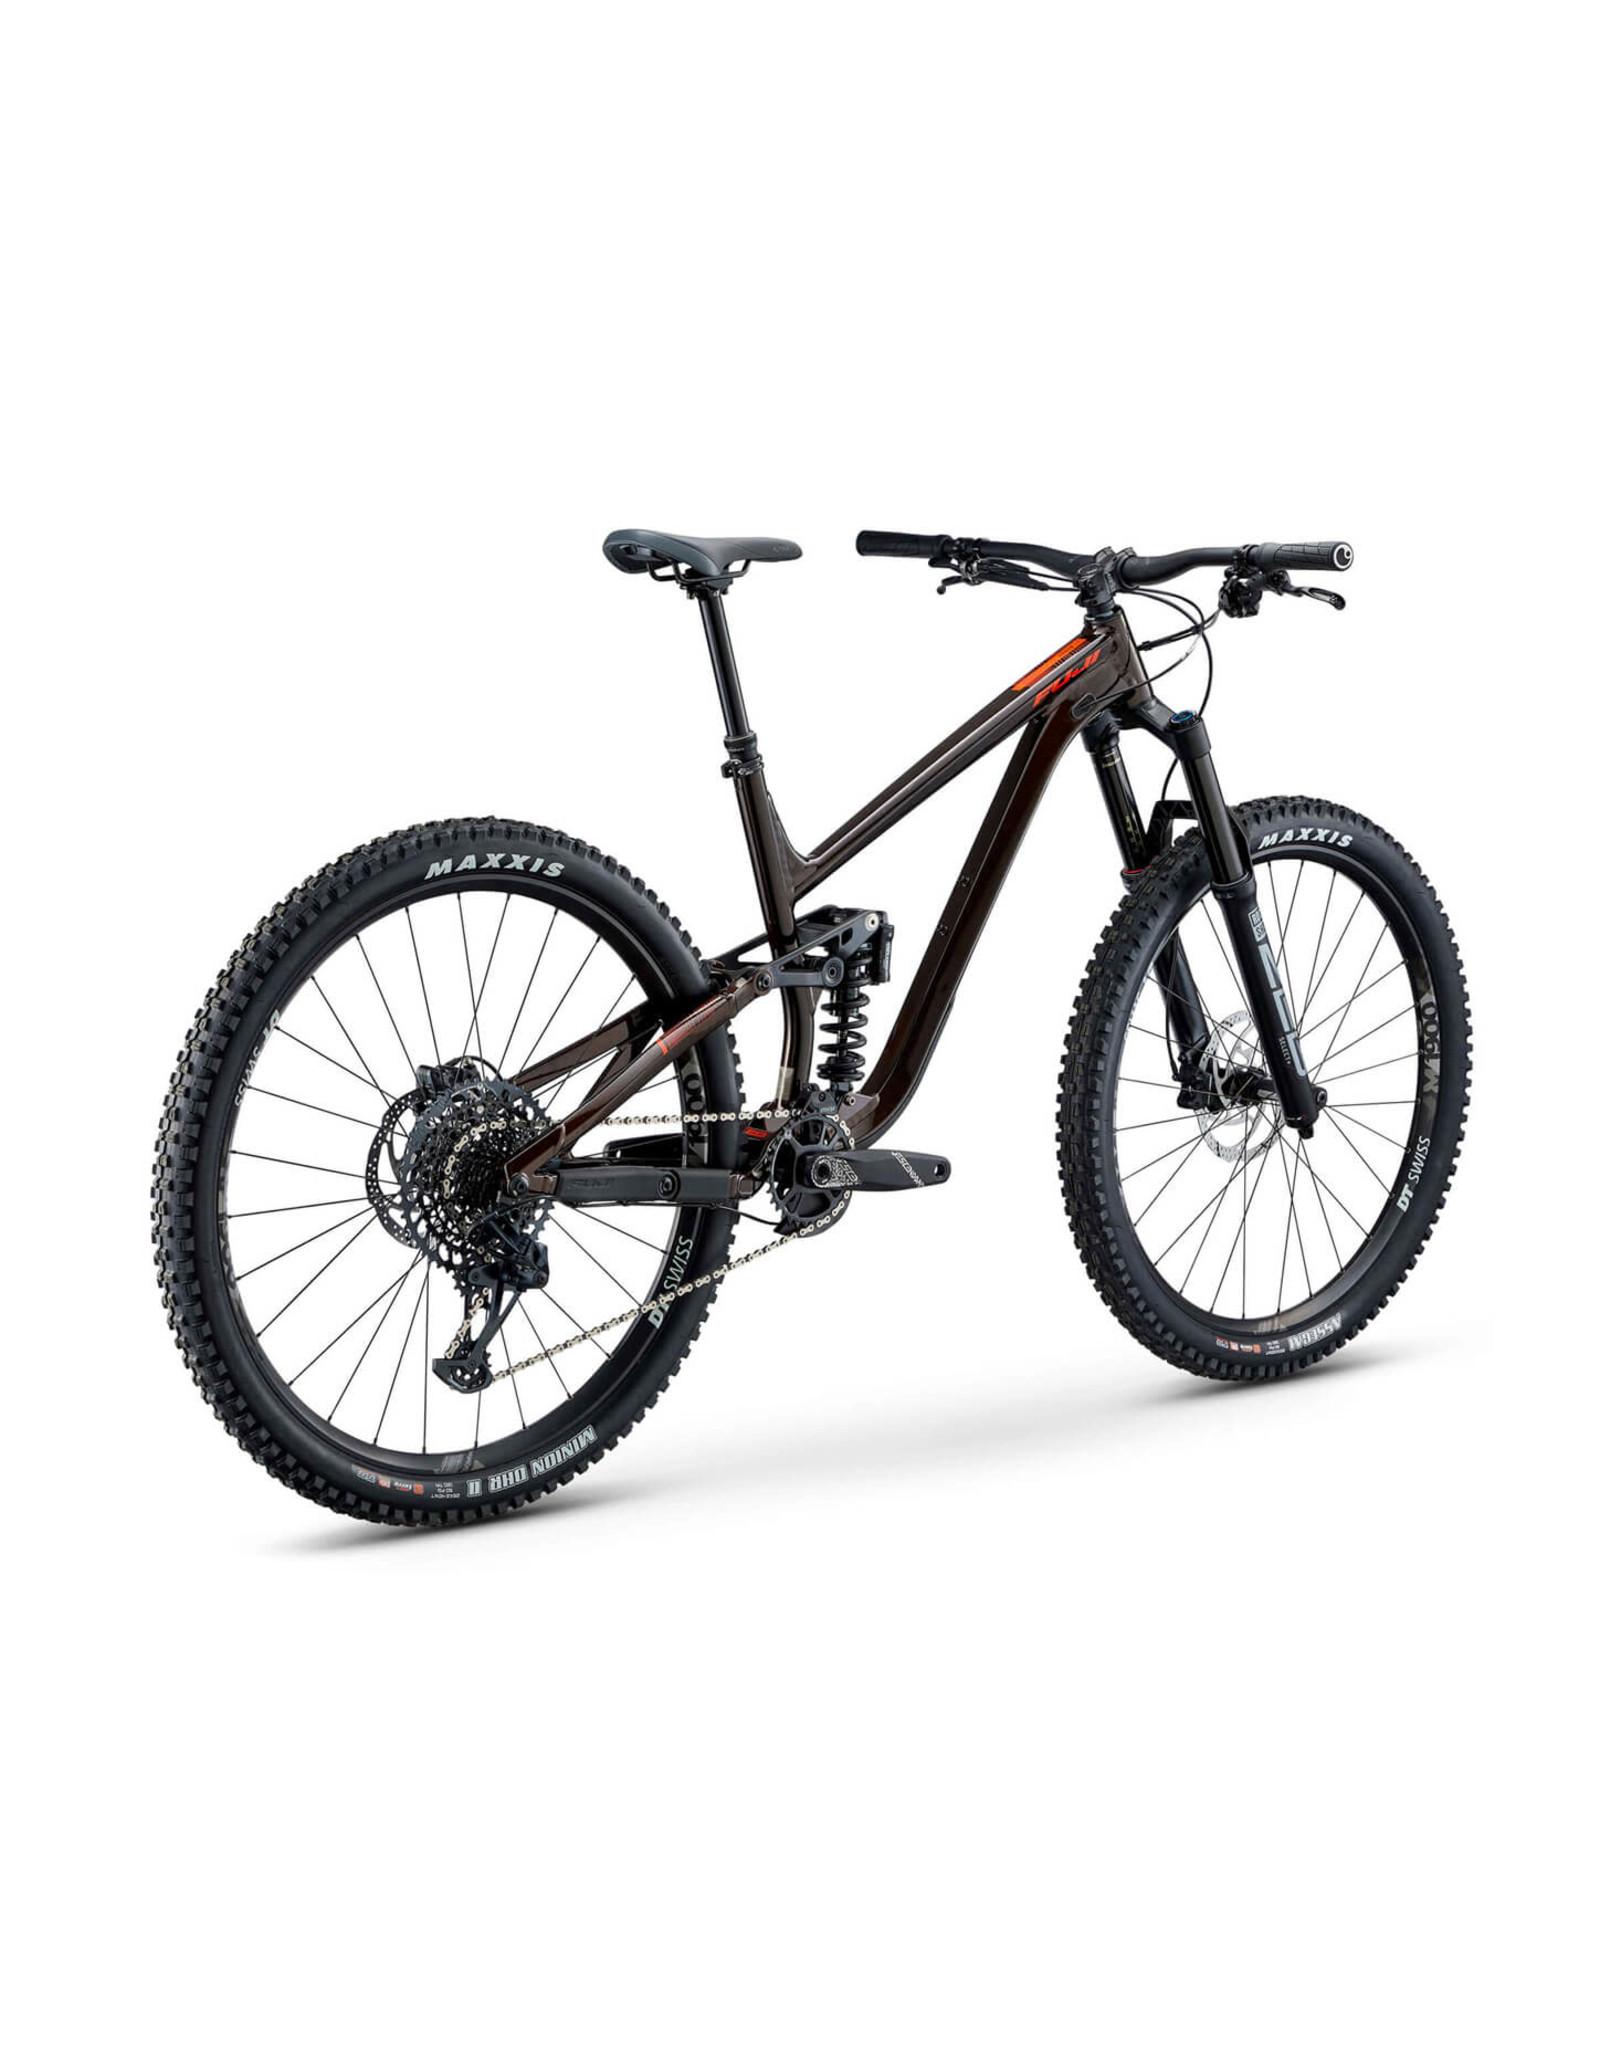 Fuji Fuji Rakan 29 LT 1.1 dark bronze-red mountain trail bike